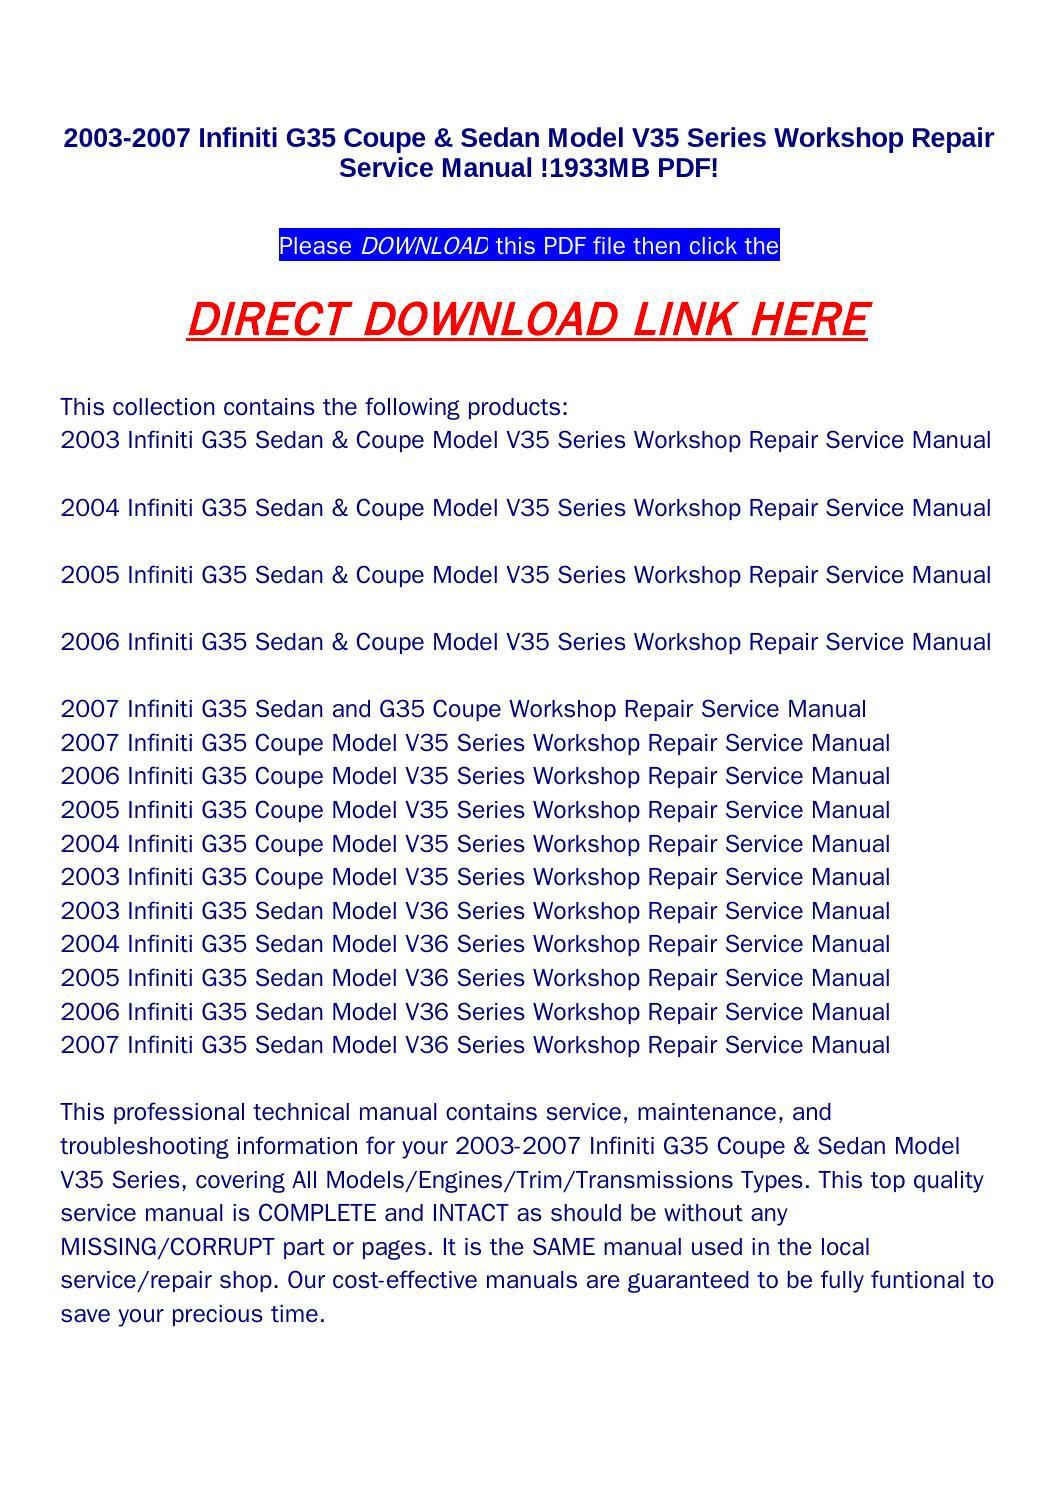 2003 2007 infiniti g35 coupe sedan model v35 series workshop rh issuu com 2006 Infiniti G35 Manual Book 2006 Infiniti G35 Custom